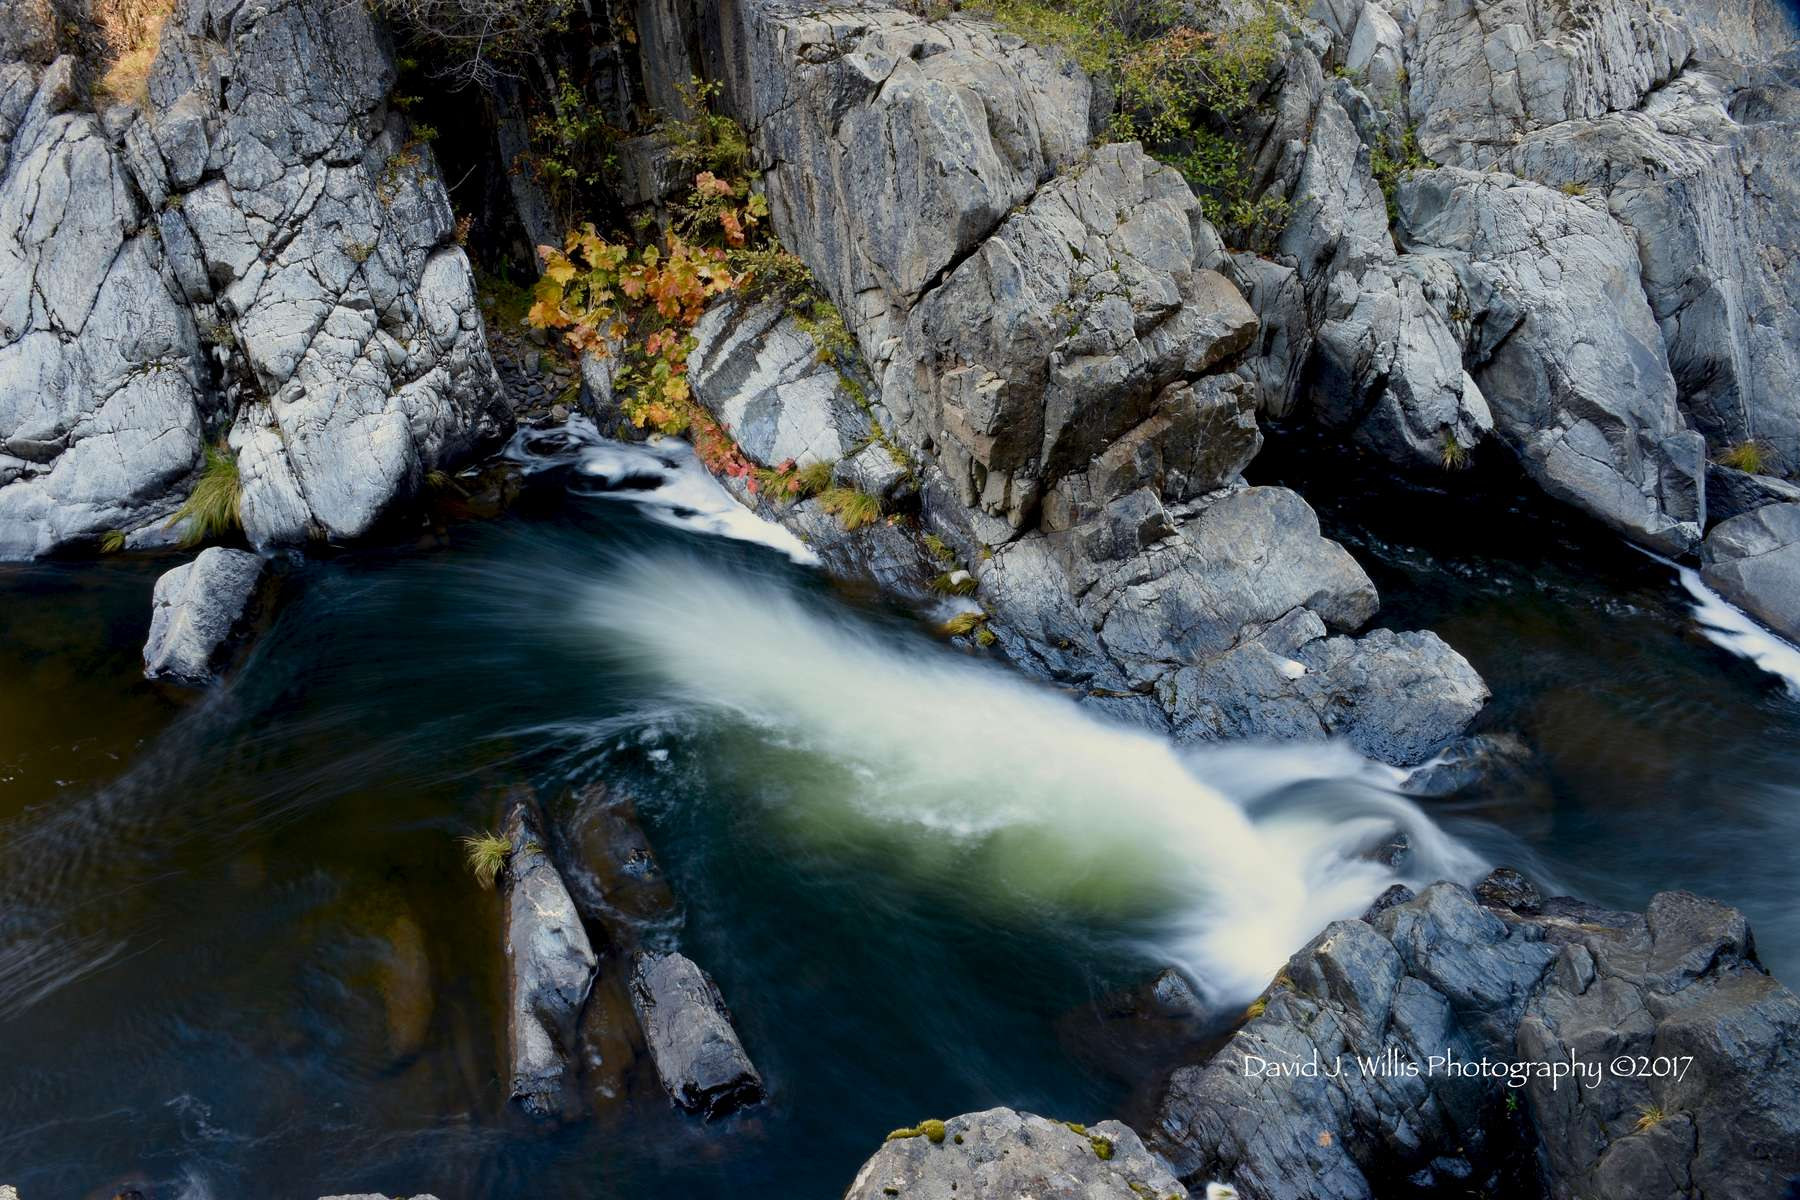 Rocks and Indian Rhubarb, Keddie Cascades, Spanish Creek, Fall, Plumas County